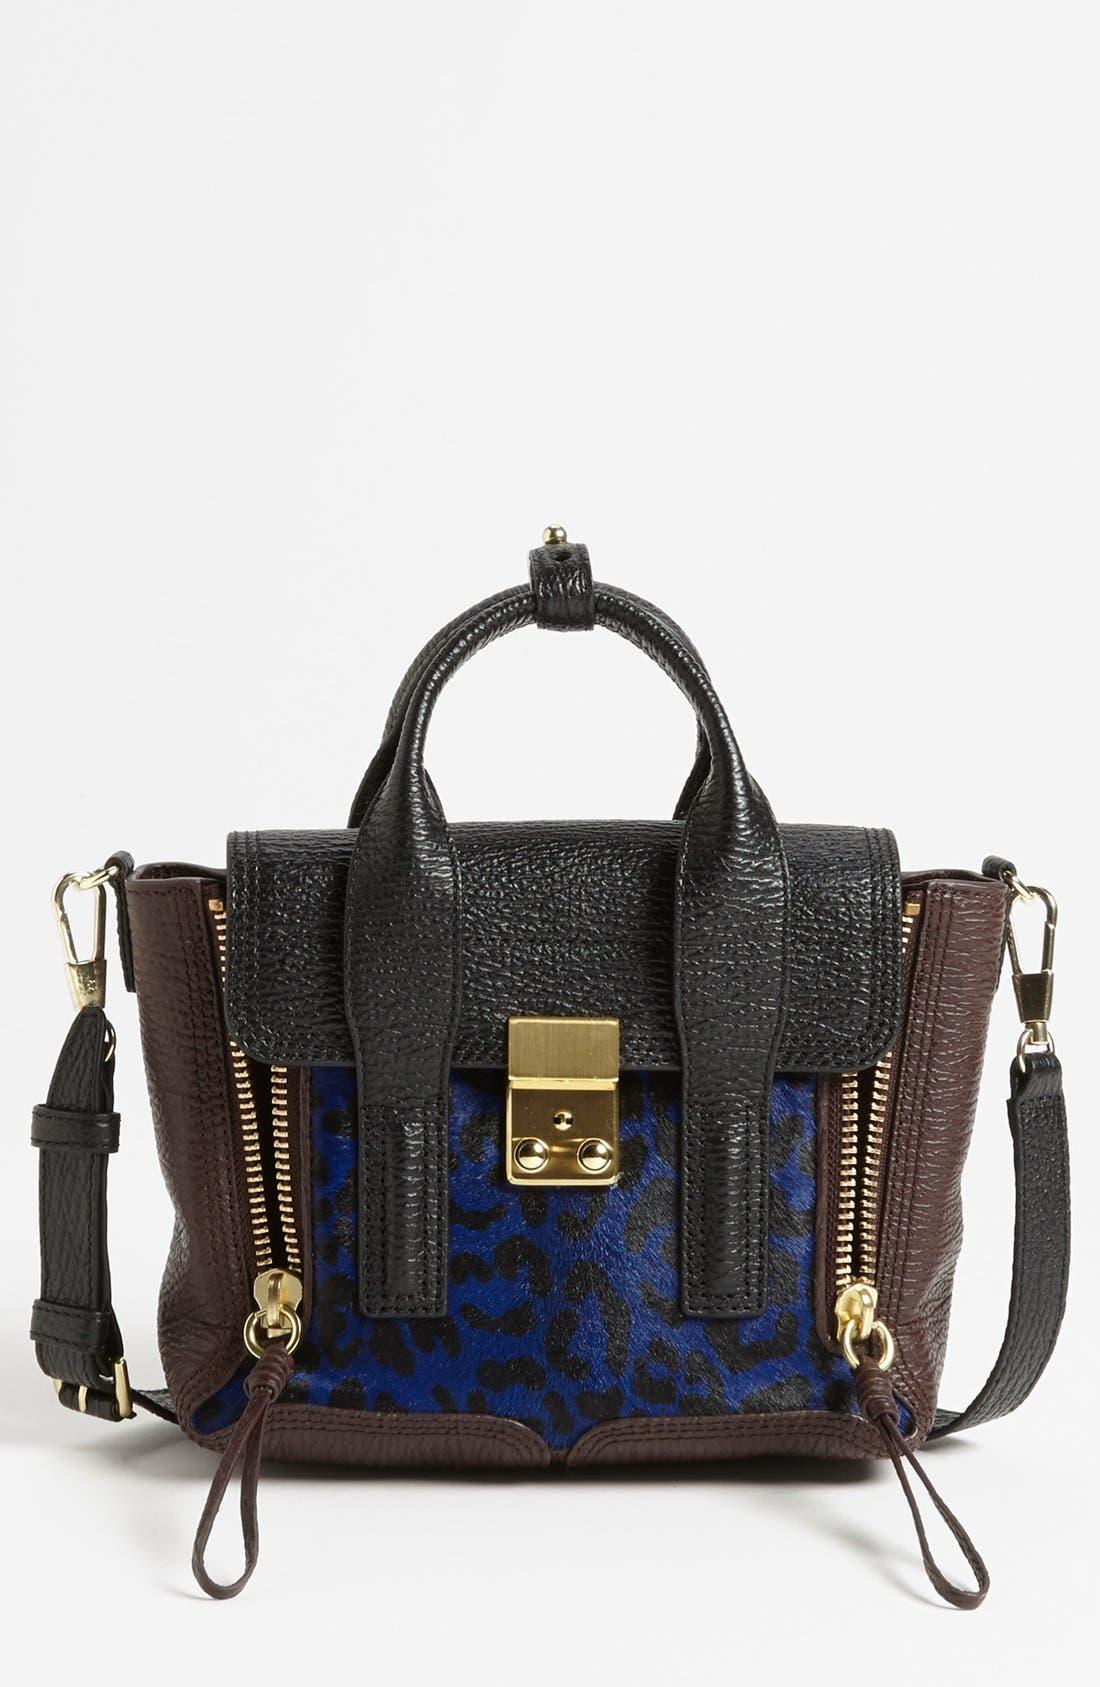 Main Image - 3.1 Phillip Lim 'Mini Pashli' Leather Satchel